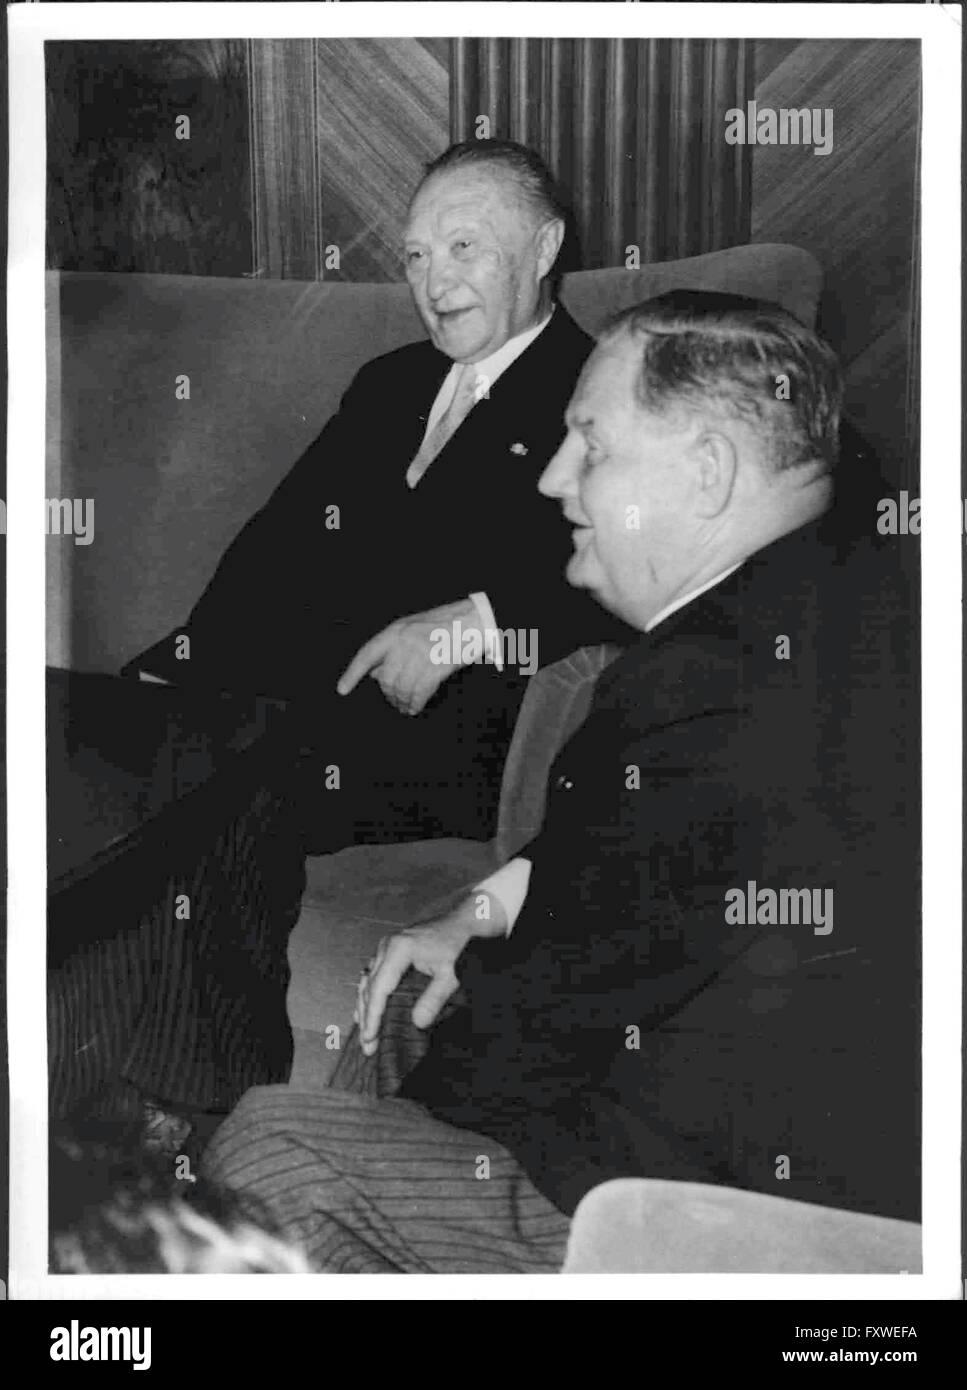 Adenauer in Wien - Stock Image